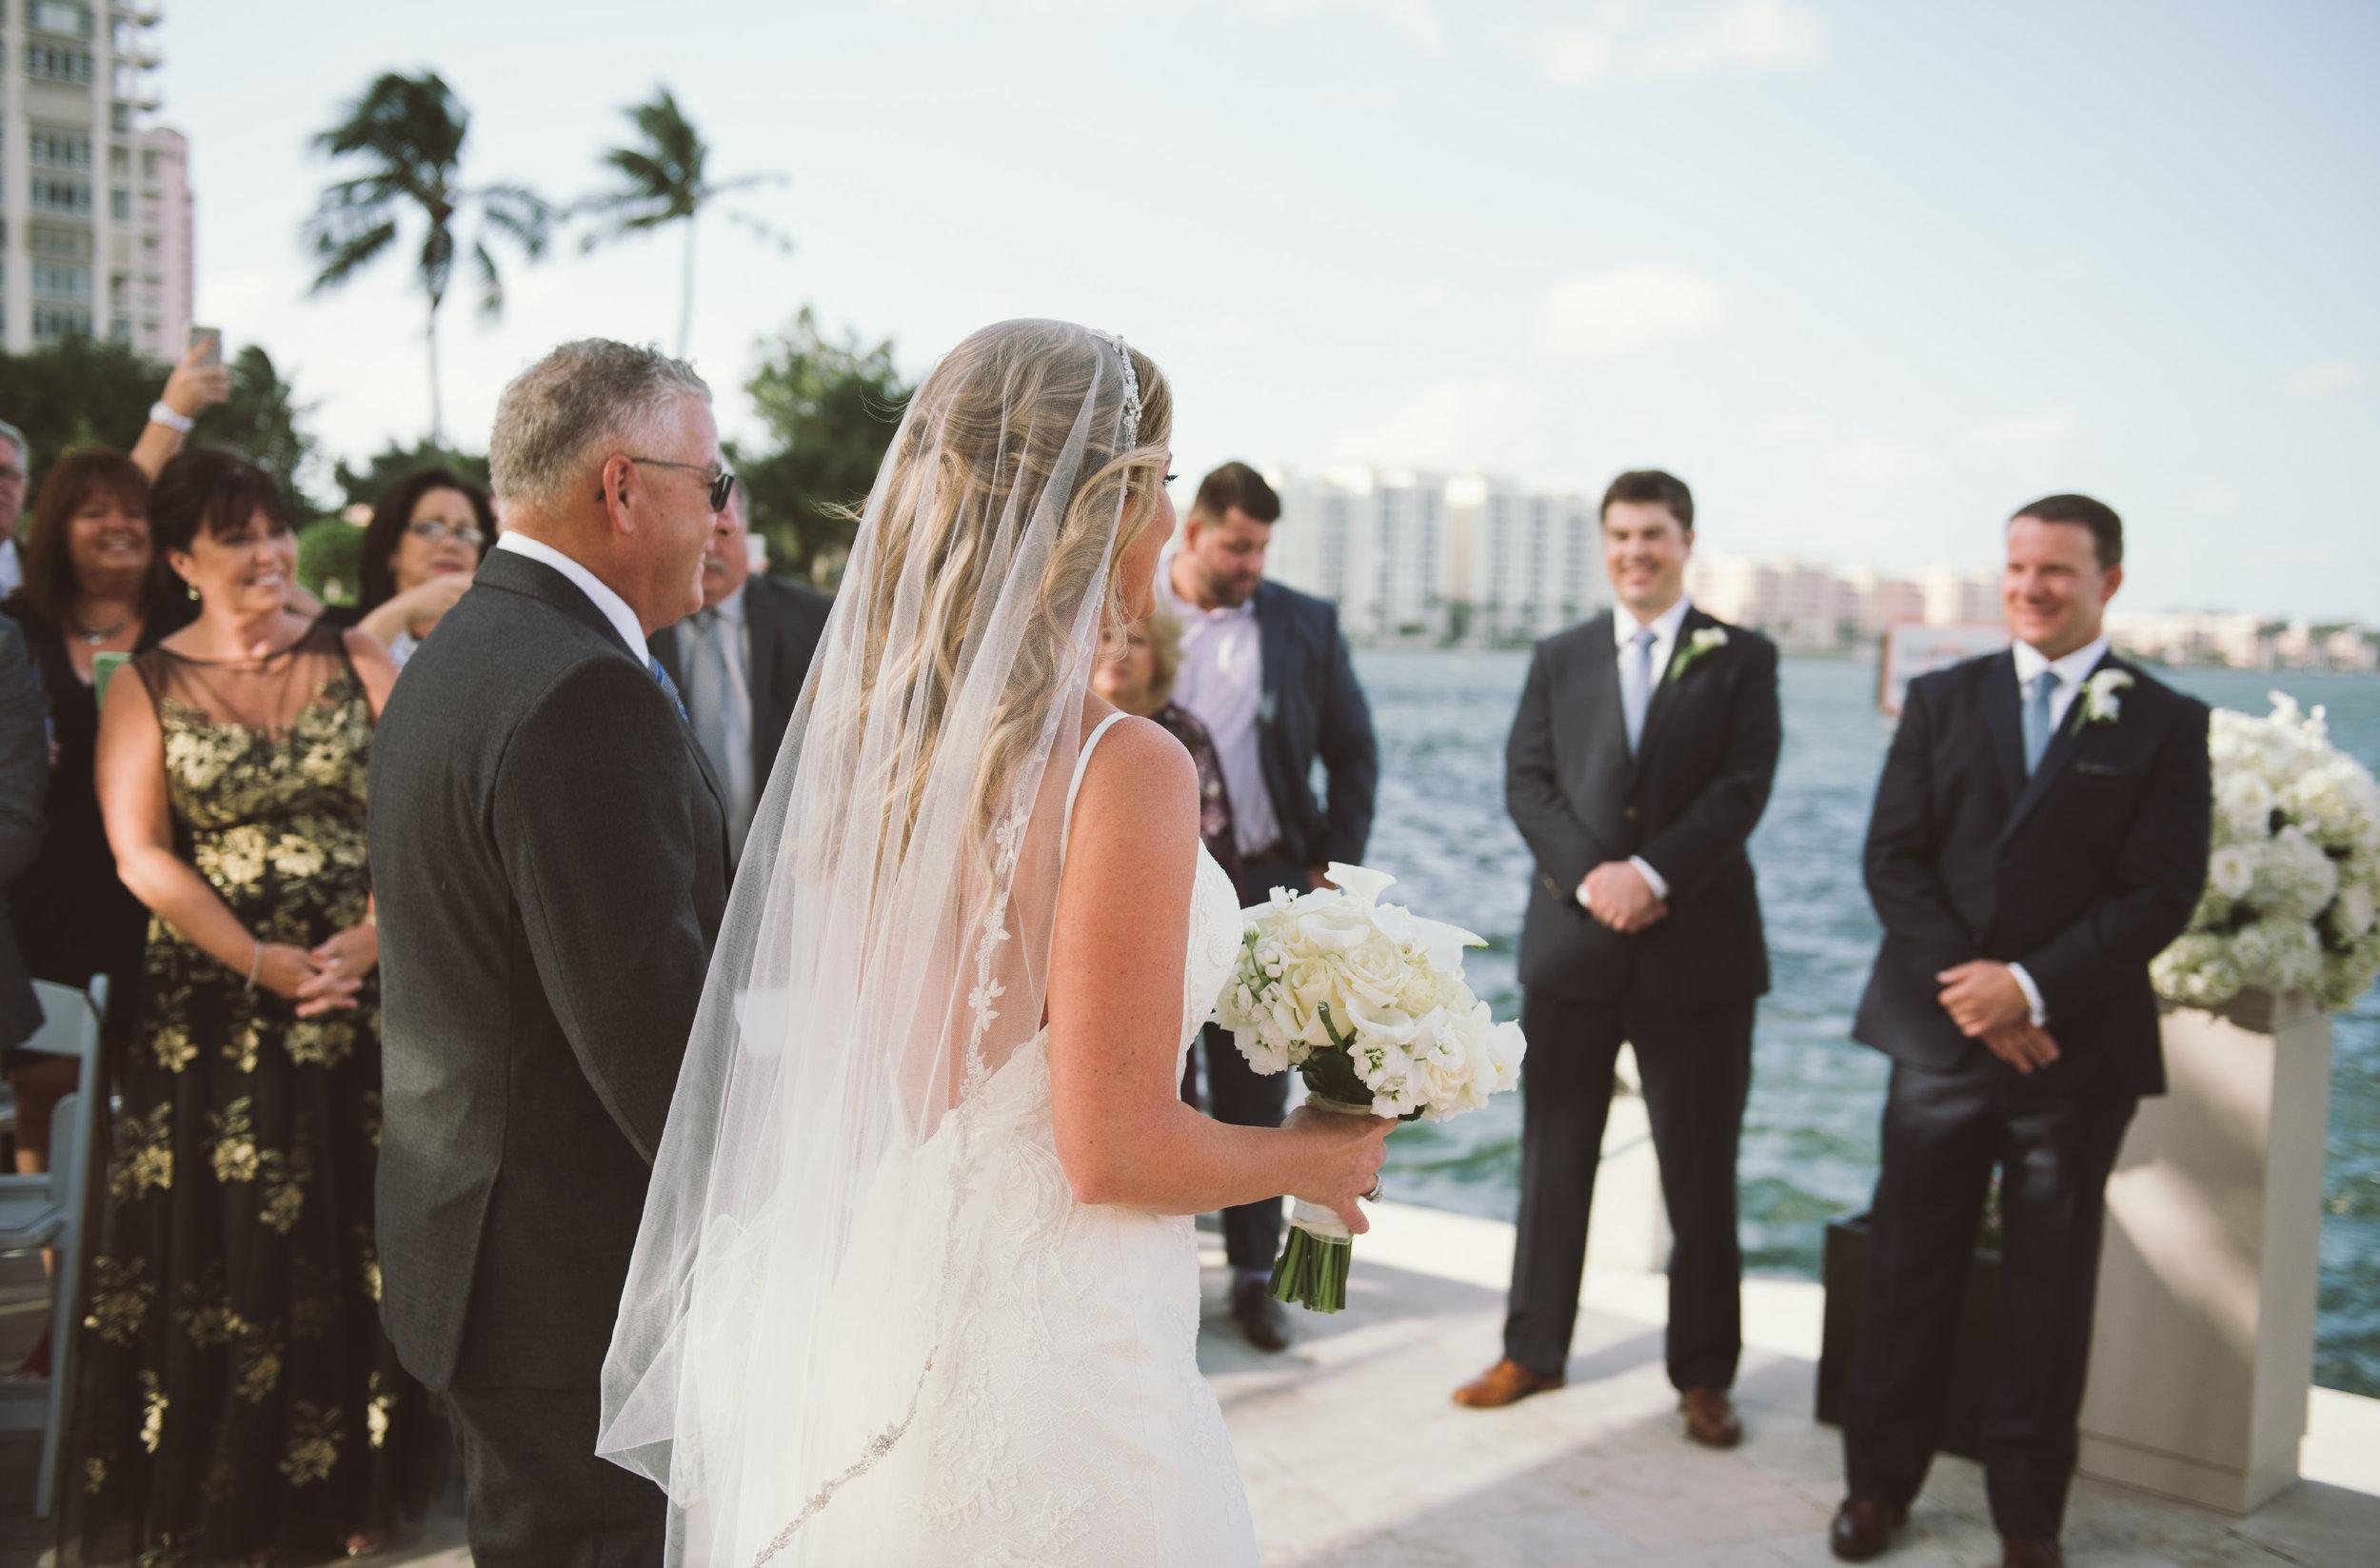 Kim + John's Wedding at the Waterstone Hotel in Boca Raton44.jpg